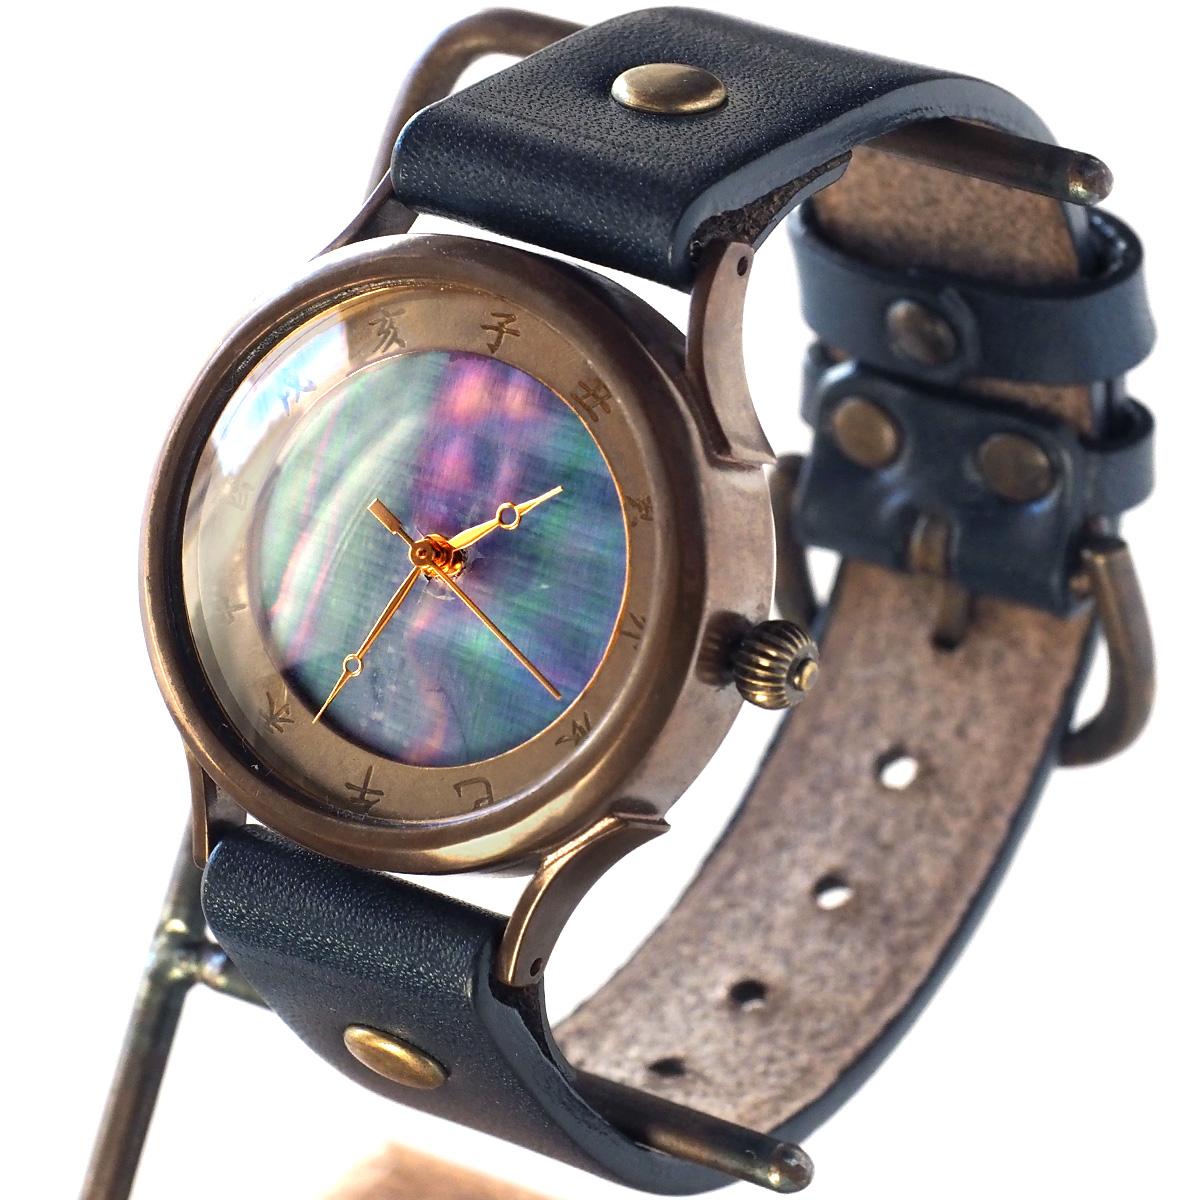 vie(ヴィー) 手作り腕時計 メイドインジャパン シリーズ 和時計 螺鈿文字盤 虹 Lサイズ [WJ-001L-NJ]